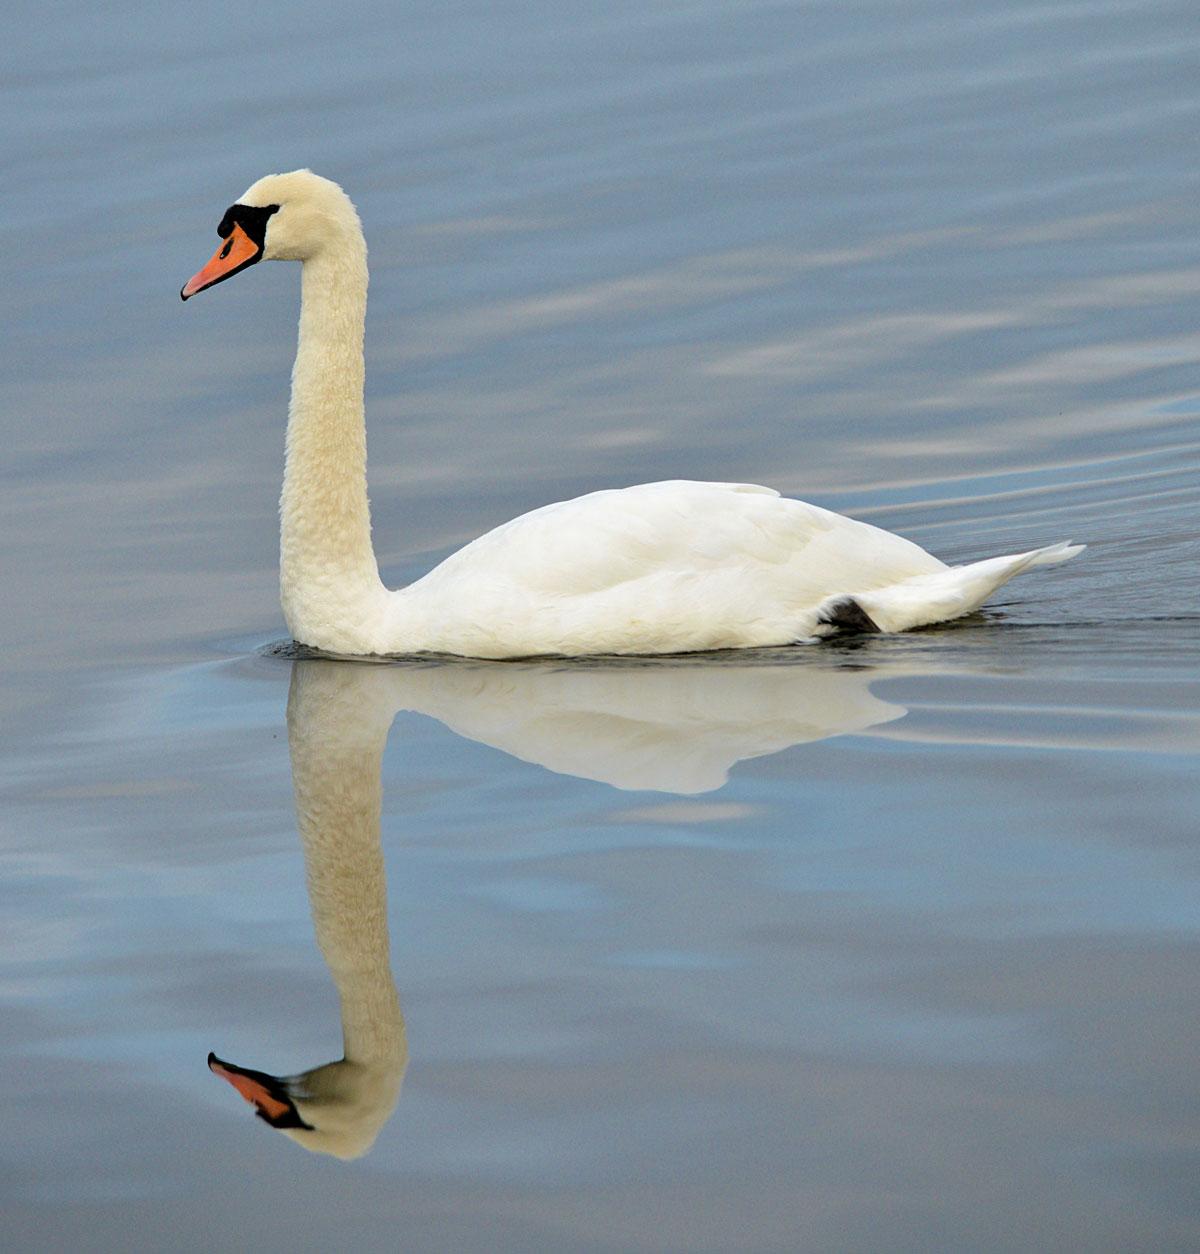 Swan reflection.